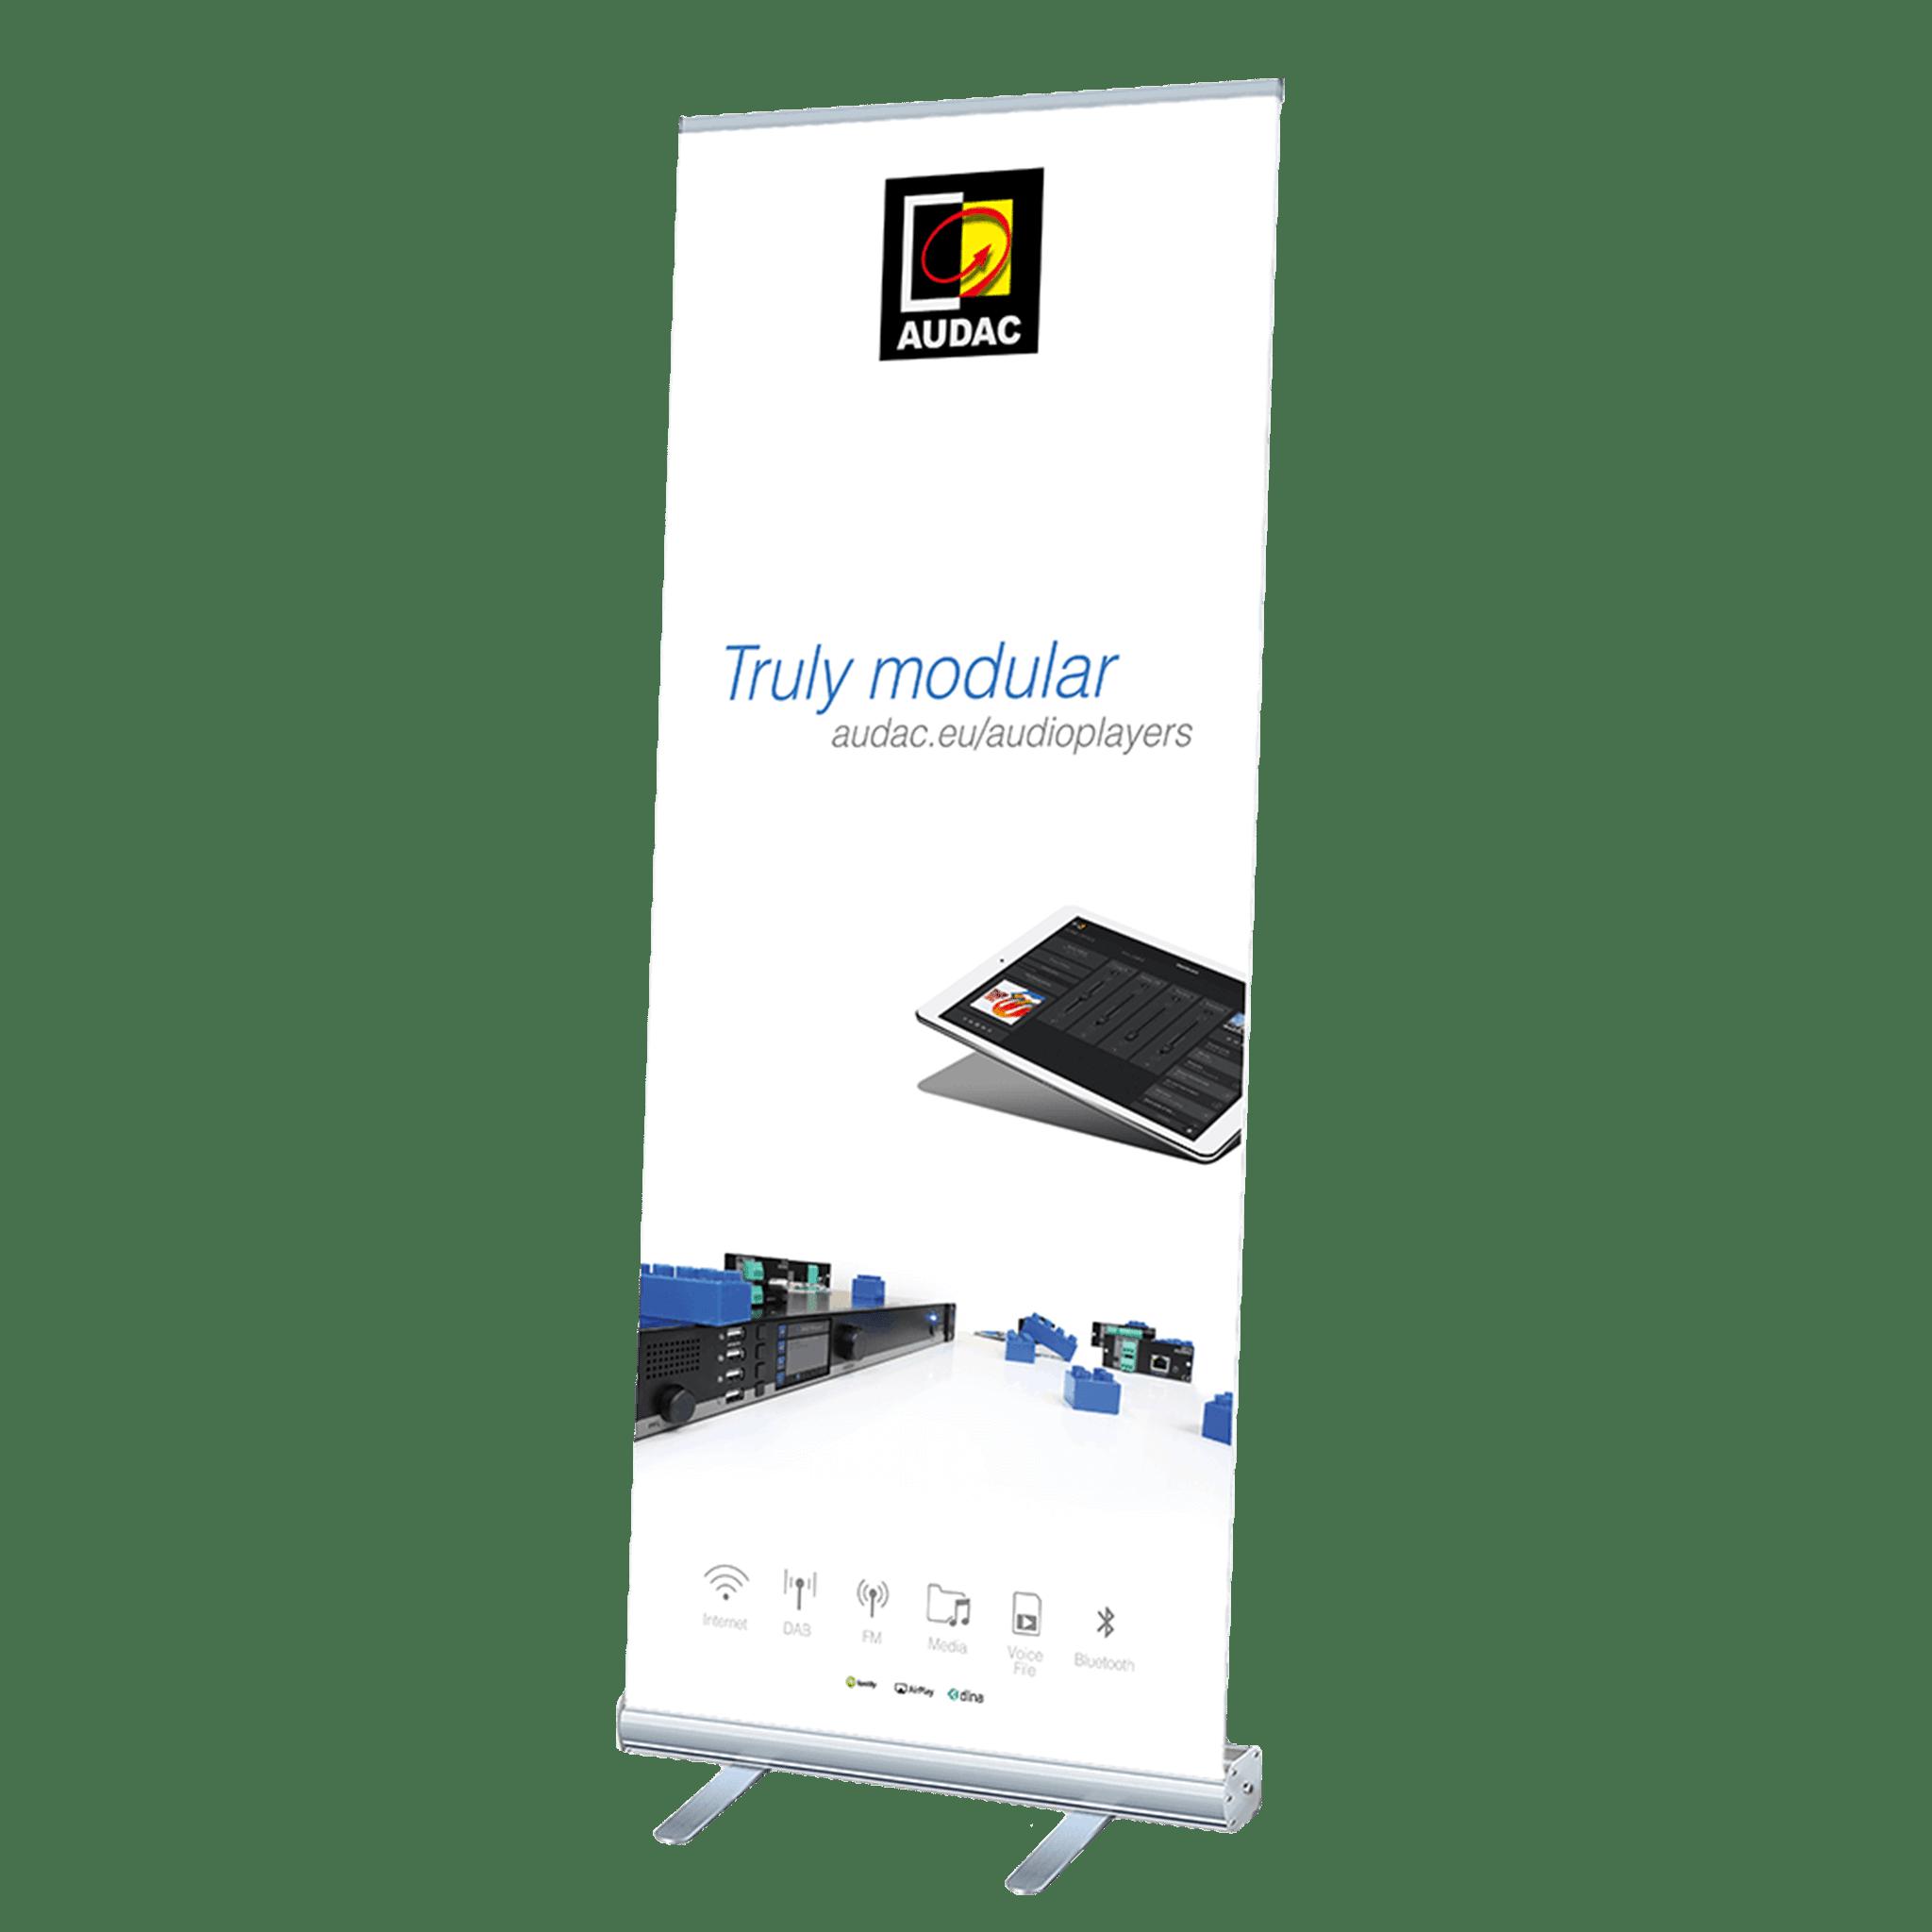 PROMO5300 - AUDAC audioplayers roll-up display